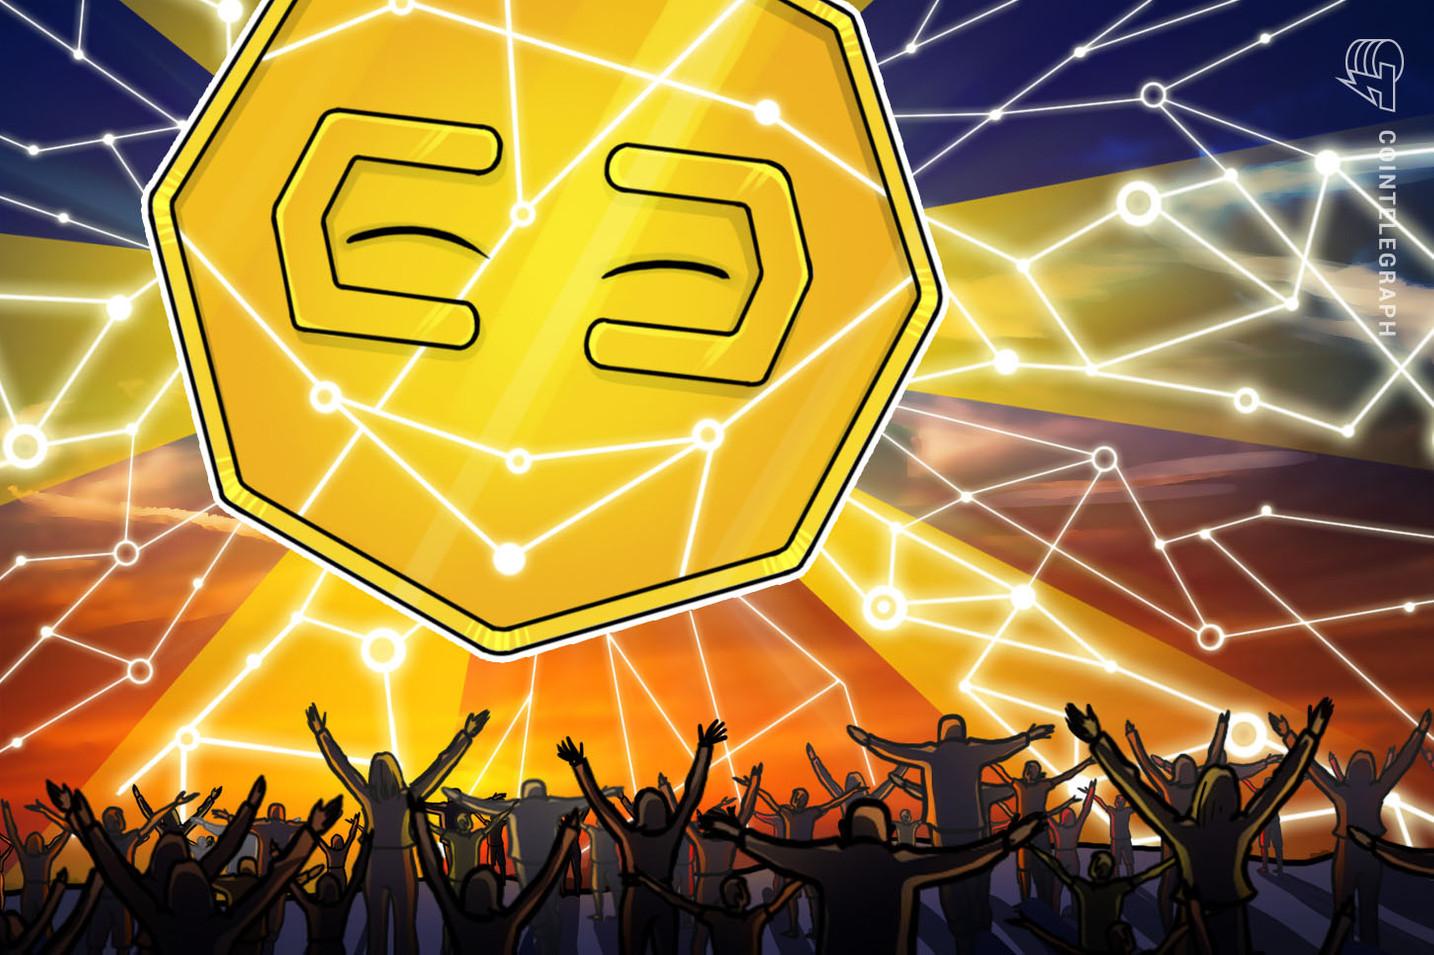 União Conservadora da Ásia-Pacífico lança ecossistema blockchain para combater autoritarismo